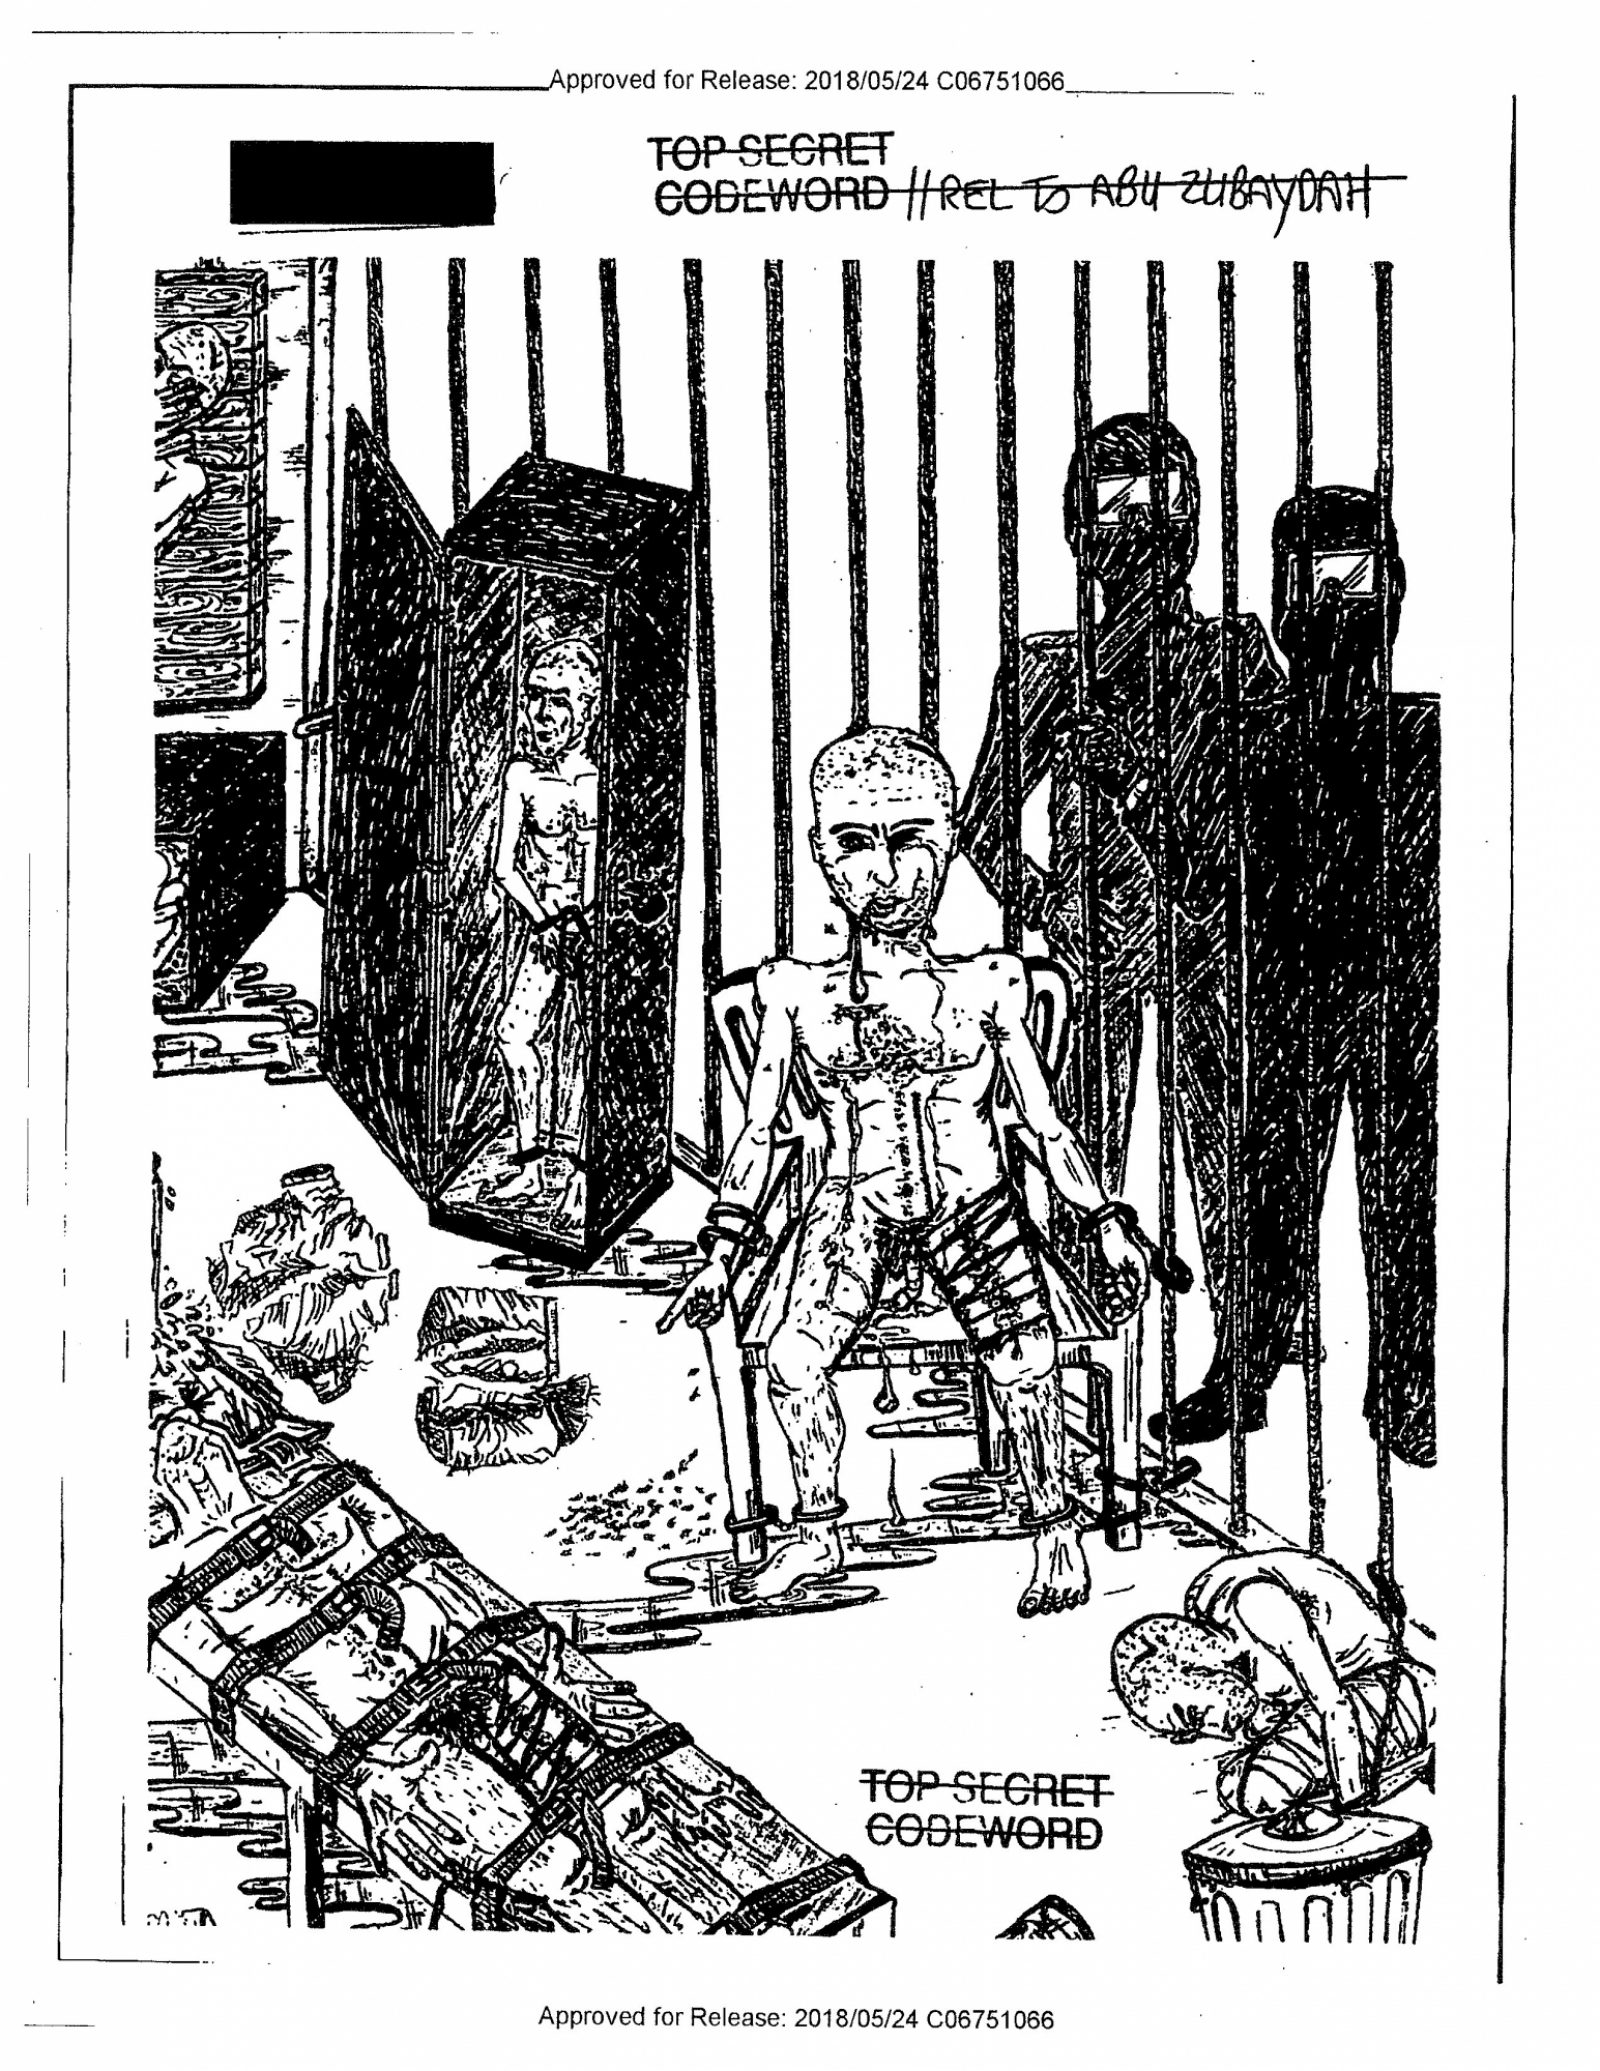 20180525-FOIA-response-Abu-Zubaydah-drawings-9.jpg